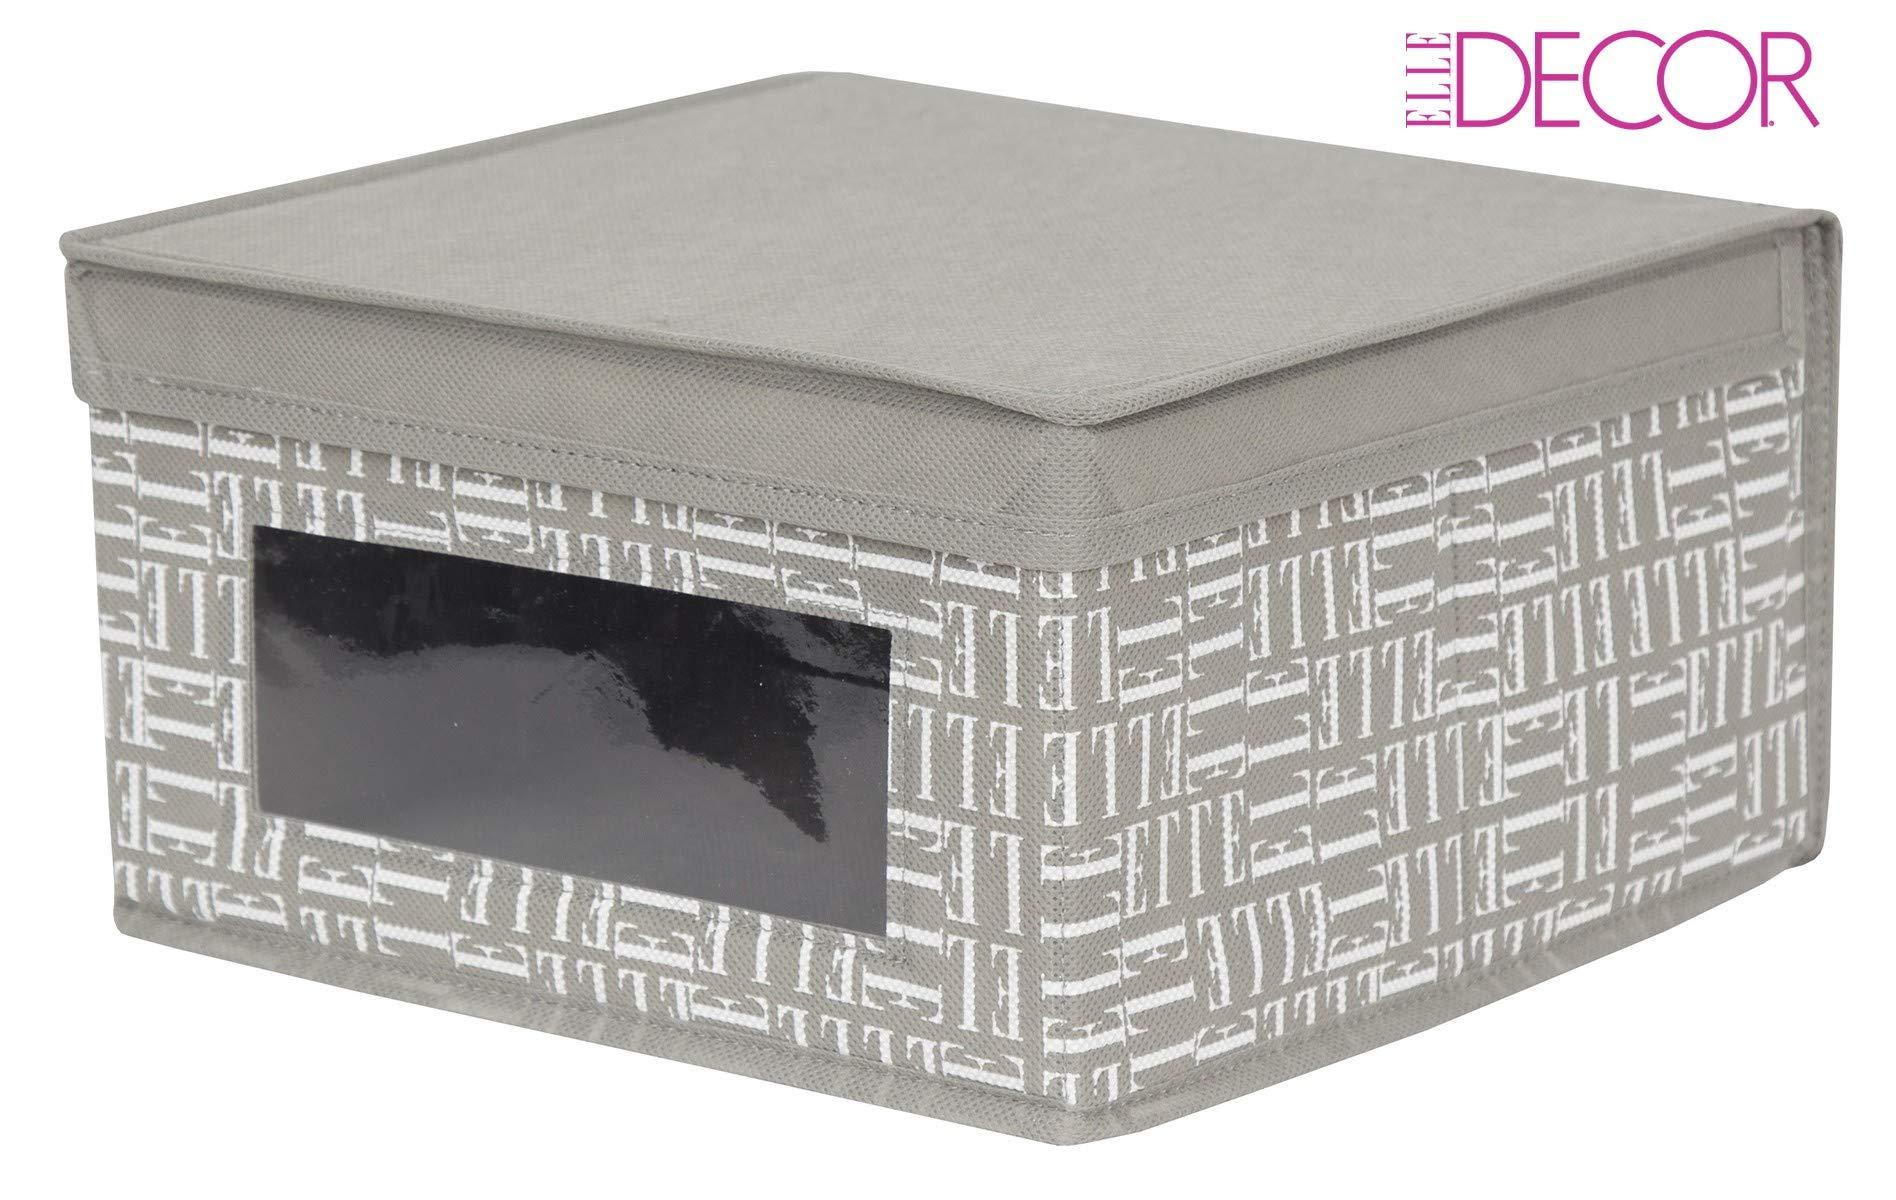 Elle Decor Window Storage Box Lid Durable Bin Basket Container Clothes Nursery Toy Organizer Seasonal